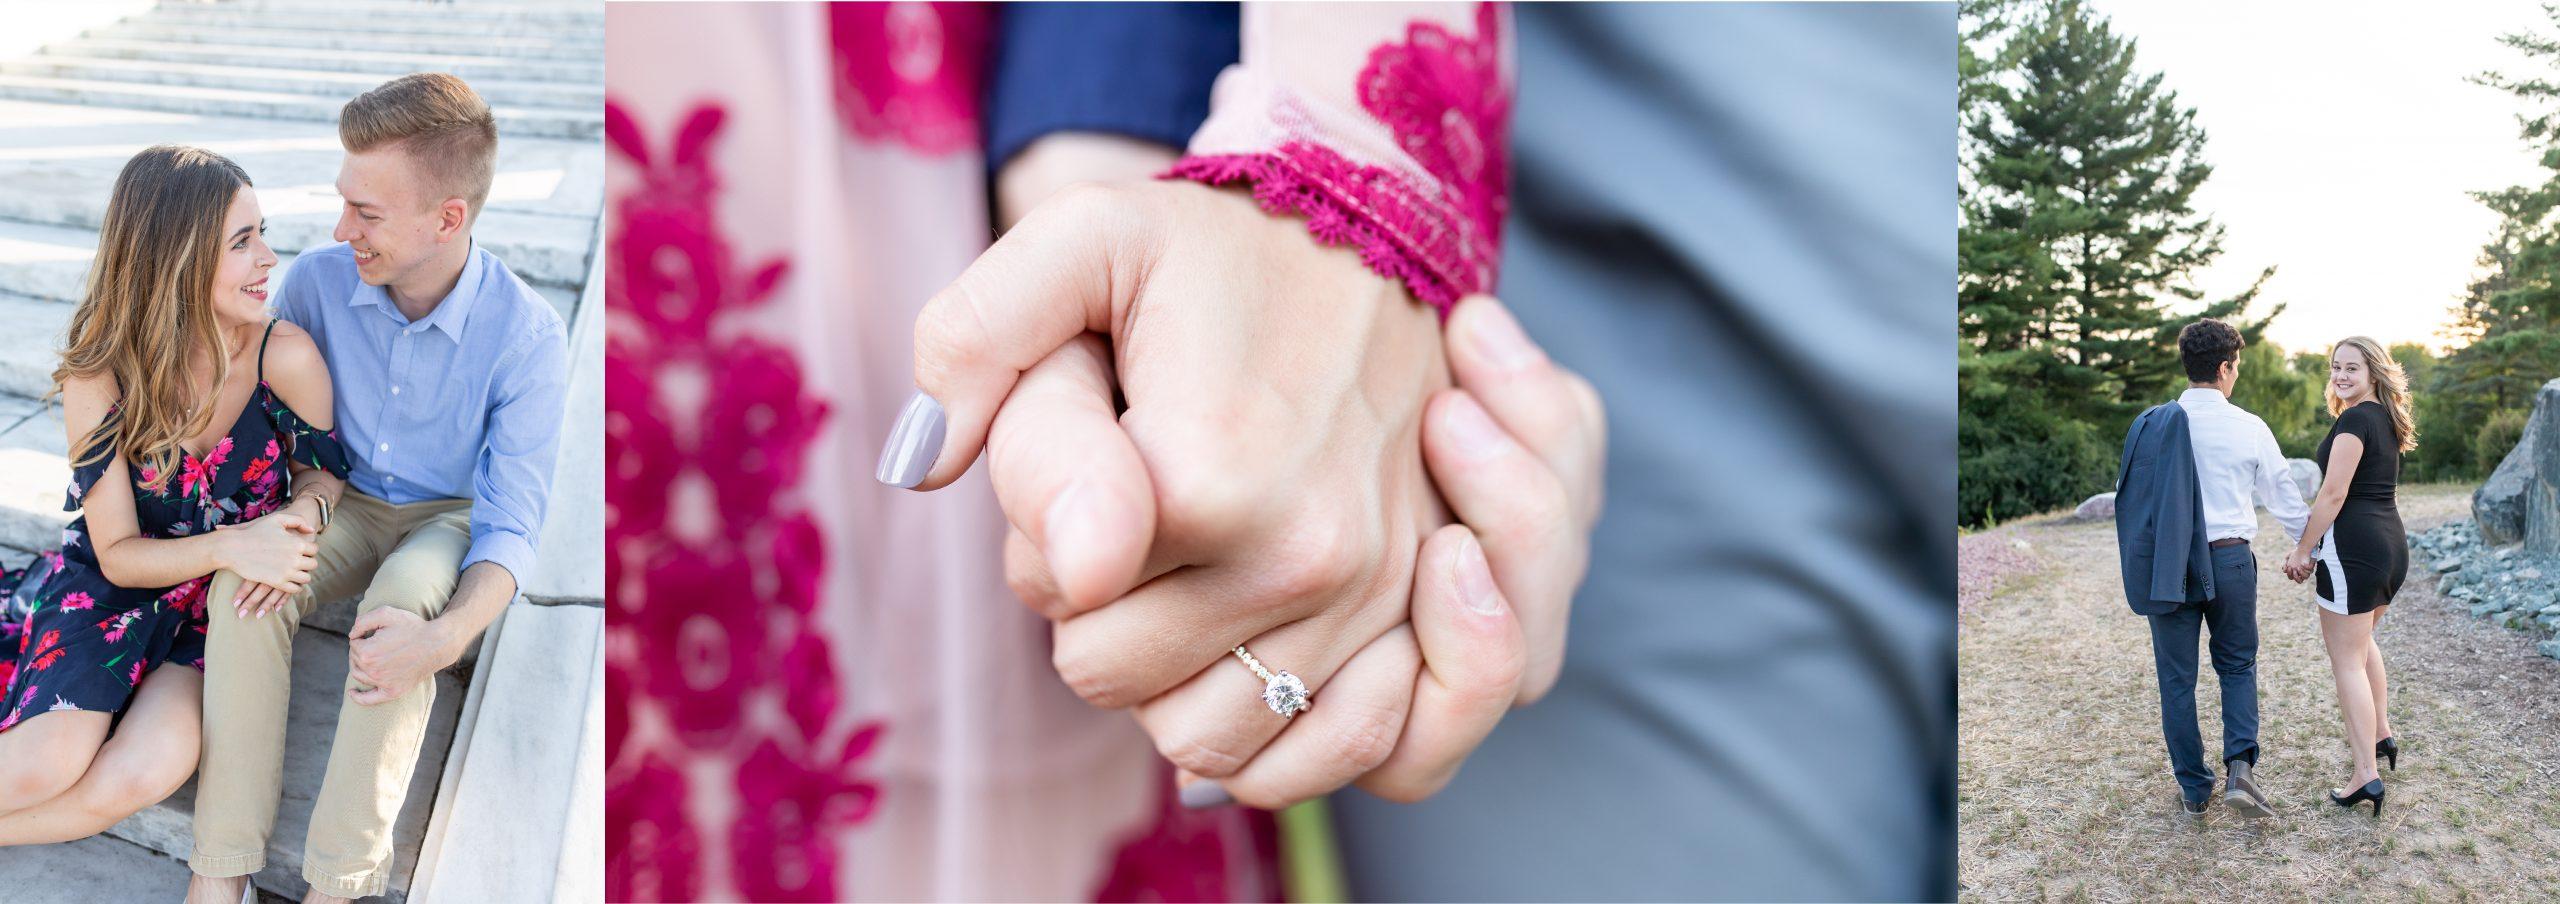 kandra-lynn-photography-wedding-photographer-14